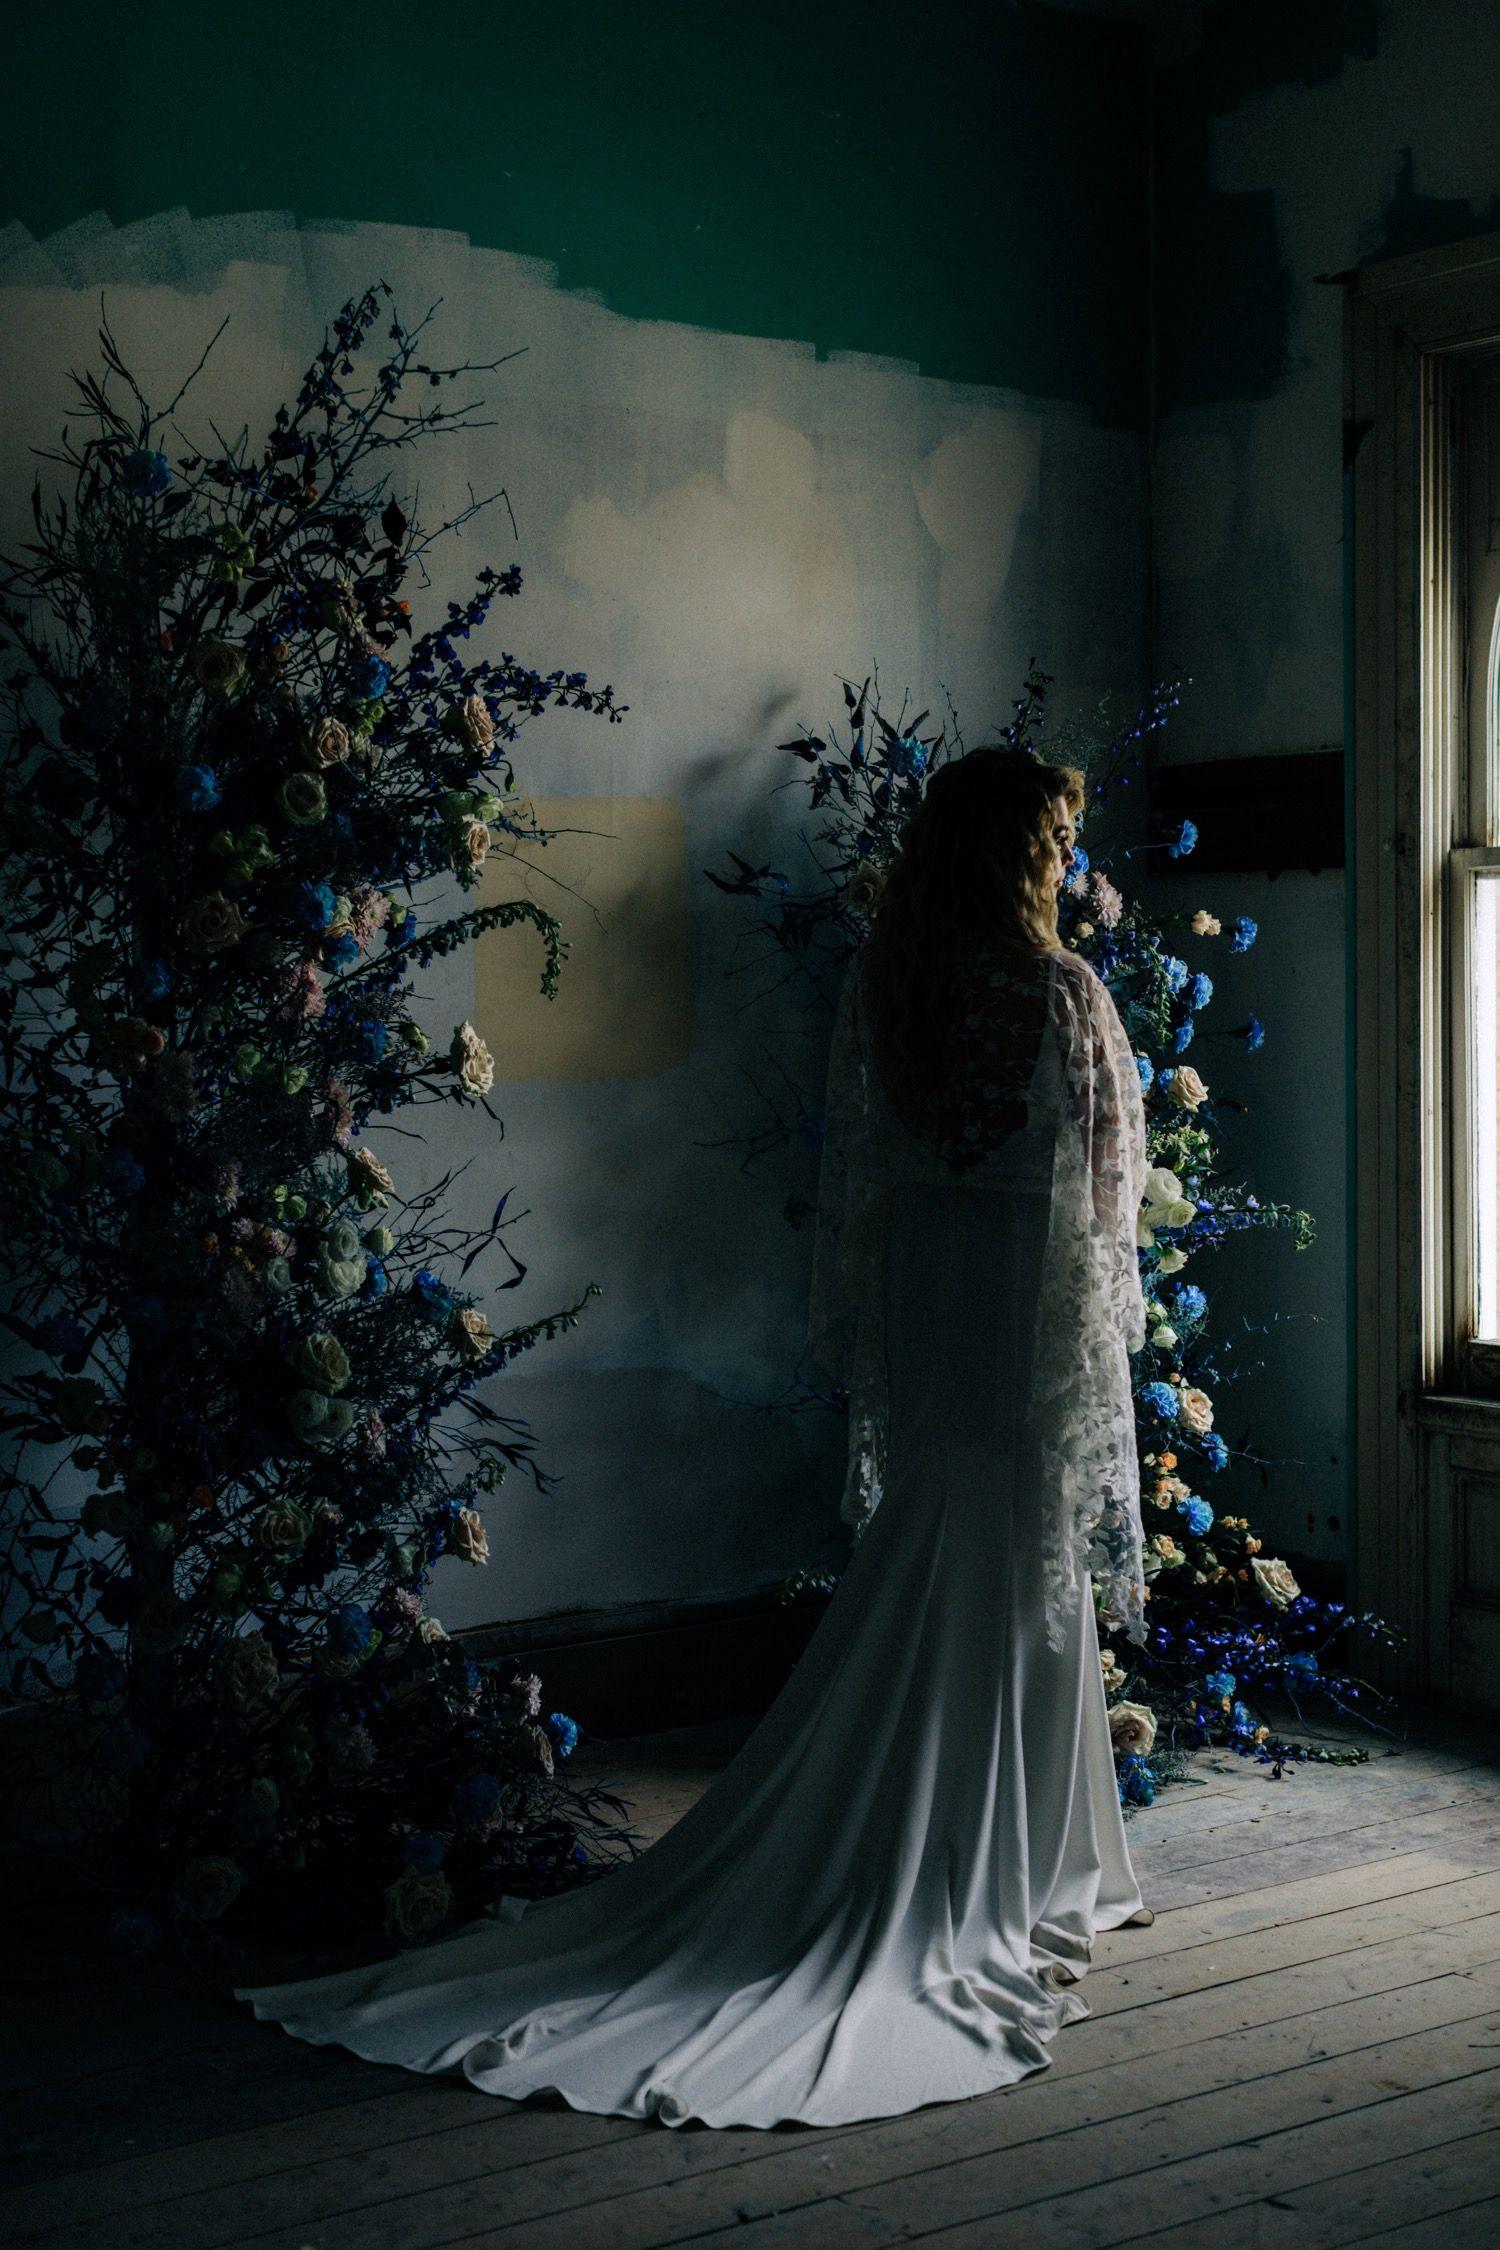 Ramsdens-photography-Wedding-photographer-hudson-valley-photoshoot-Revel32-Bridal-creative-Weird-makeup-Avant-garde-egyptian-inspiration-Look2020-gold-theme-Wild-Blooms-Bridal-macari-floral-Lady-Ramsden-Bridal-Boho-Bohemian-posing-creavity-tips-Workshop-Winter